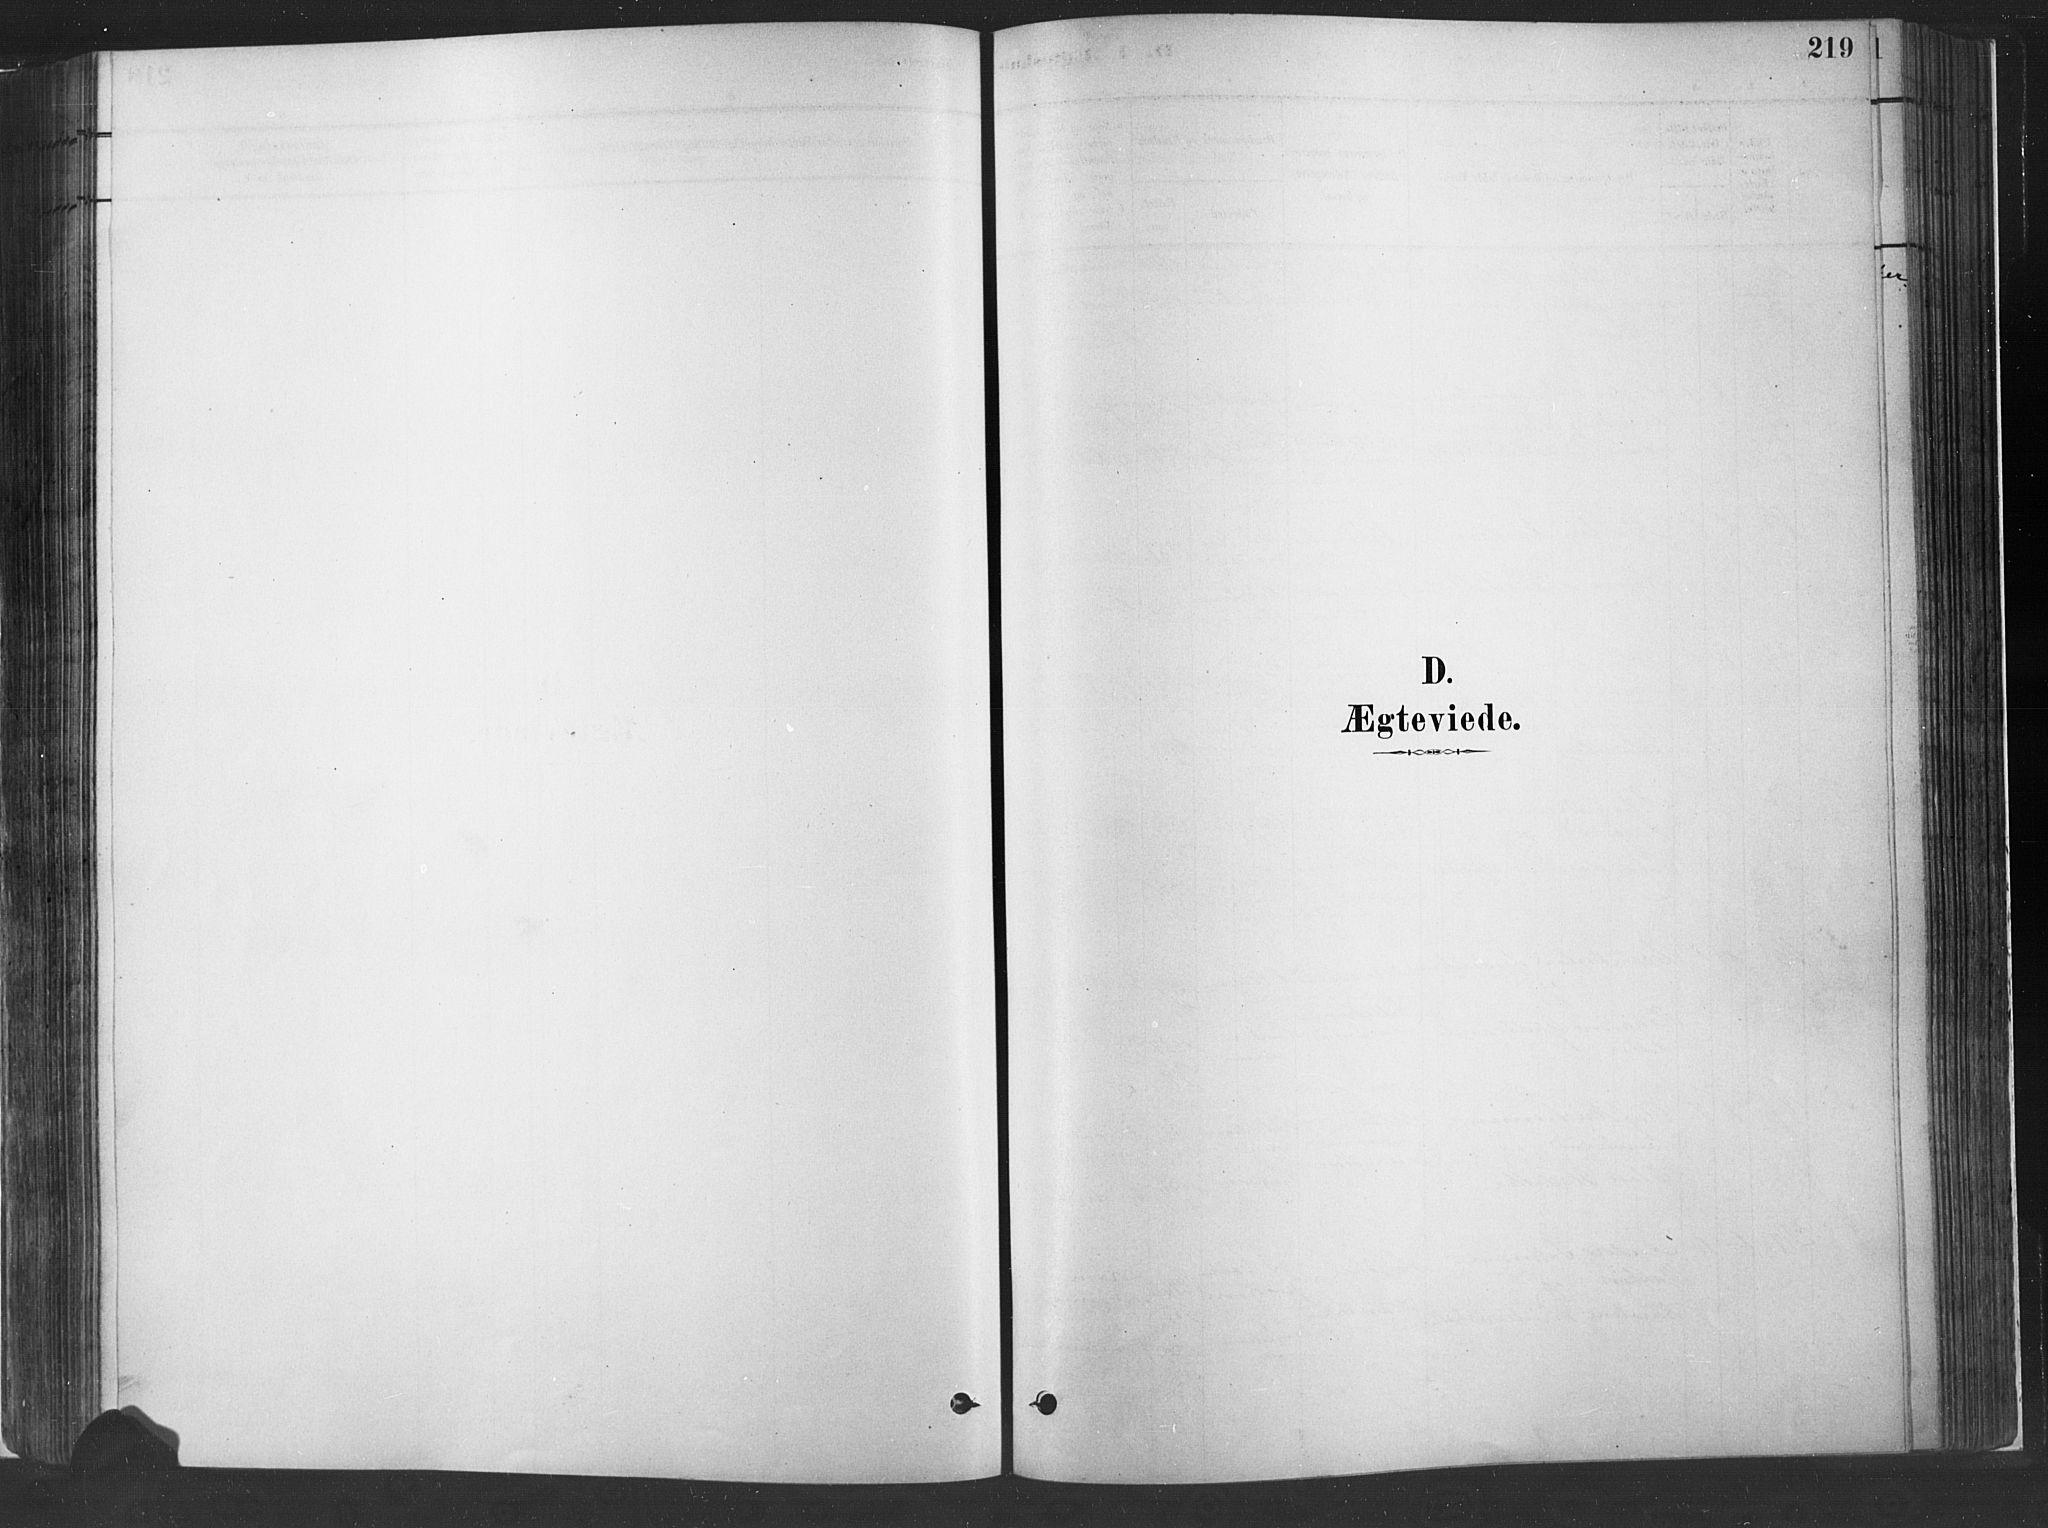 SAH, Fåberg prestekontor, H/Ha/Haa/L0010: Parish register (official) no. 10, 1879-1900, p. 219